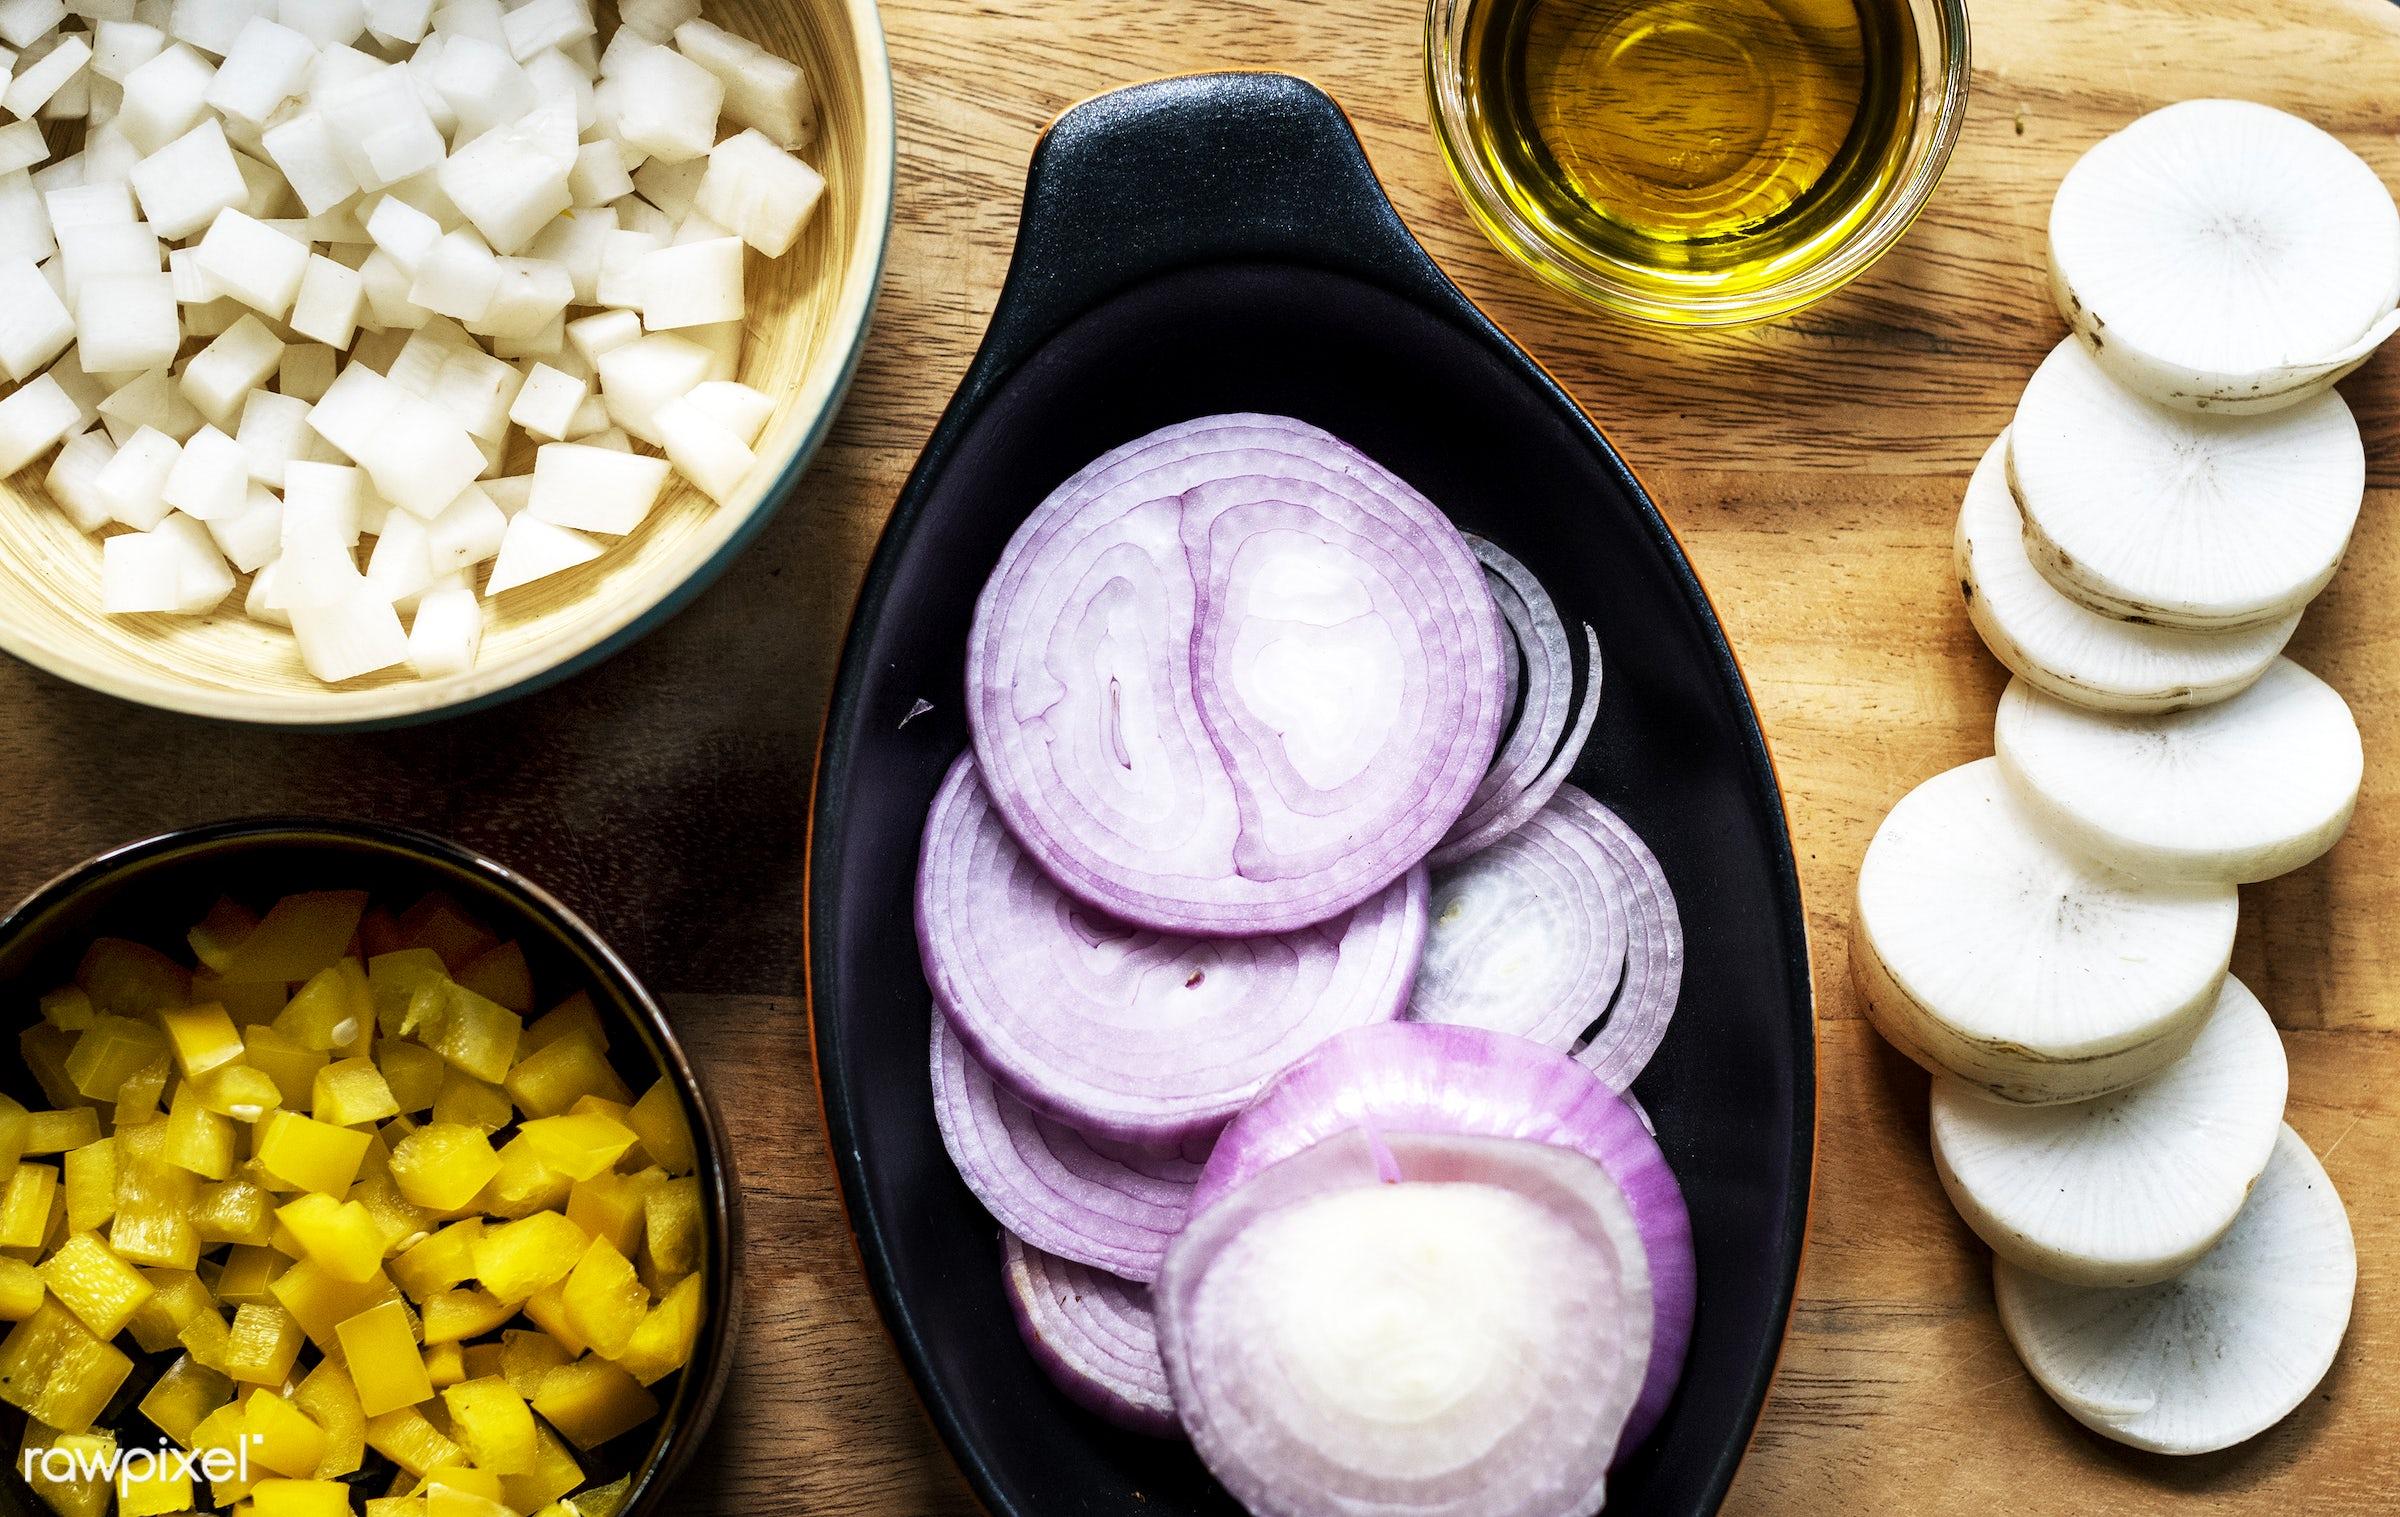 recipe, variation, type, gastronomy, ingredient, gourmet, cutting board, flavor, kitchen, red onion, health, nutrition, food...